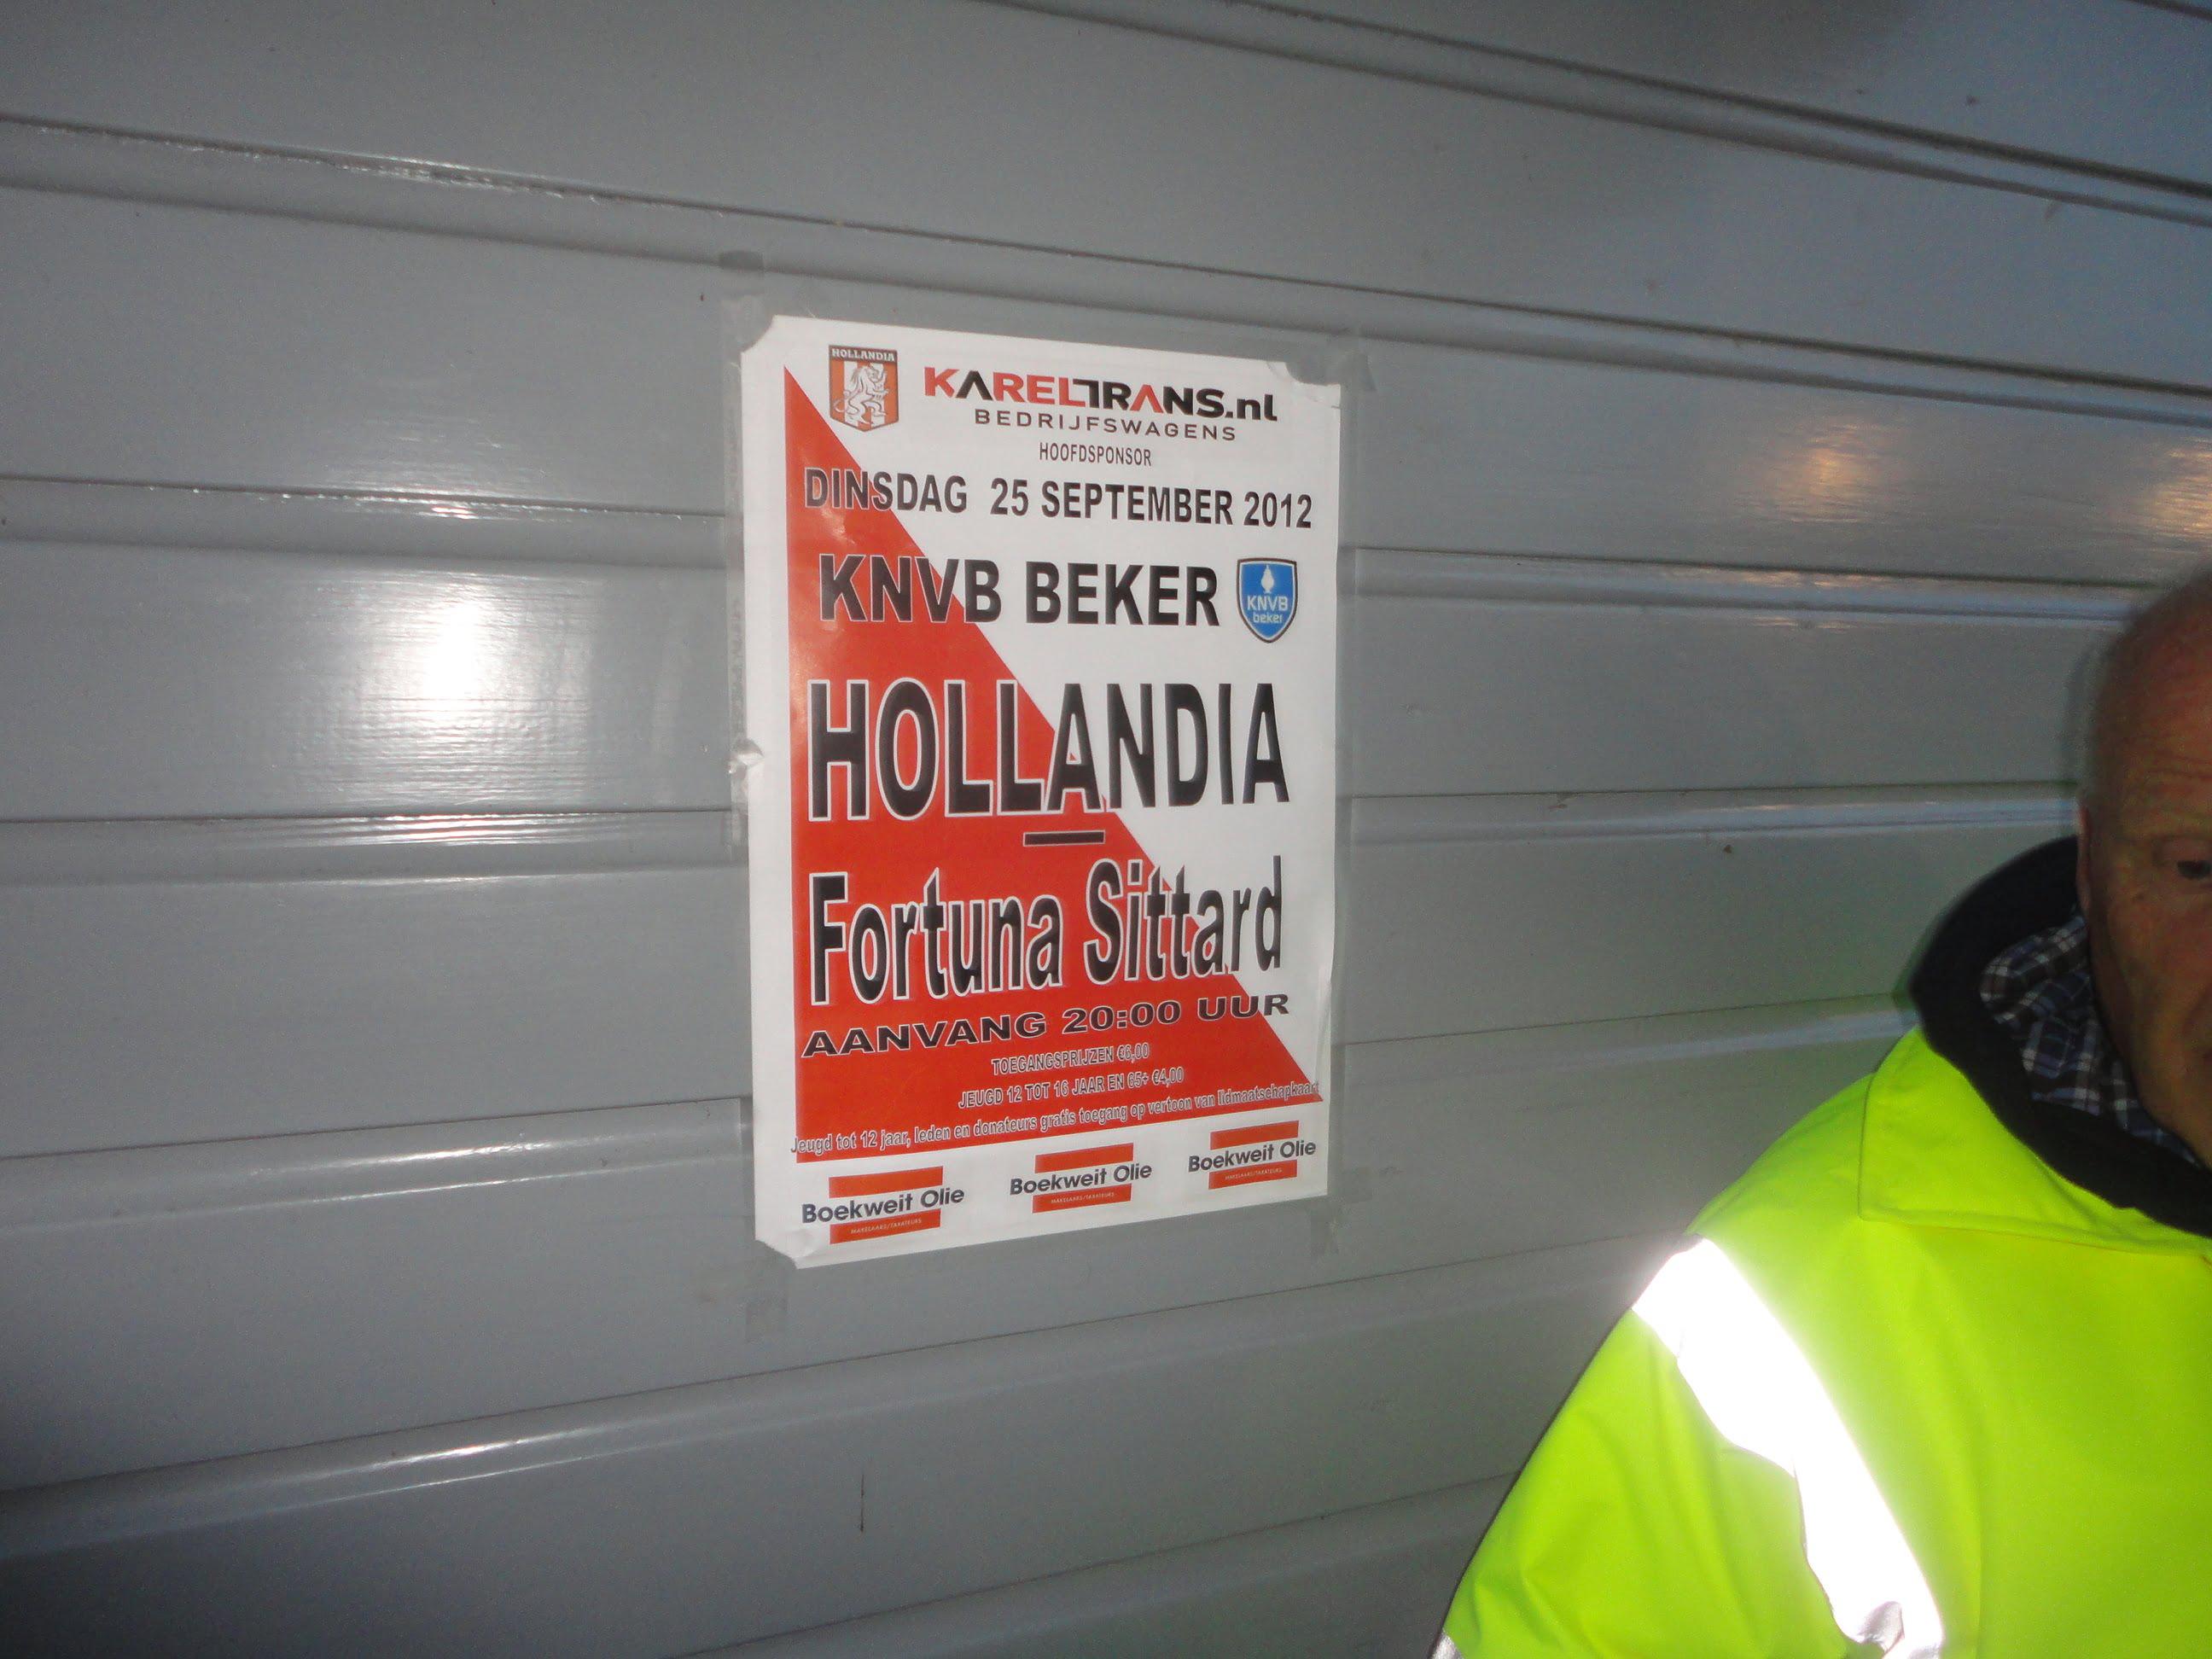 Hollandia 1 Fortuna Sittard 0